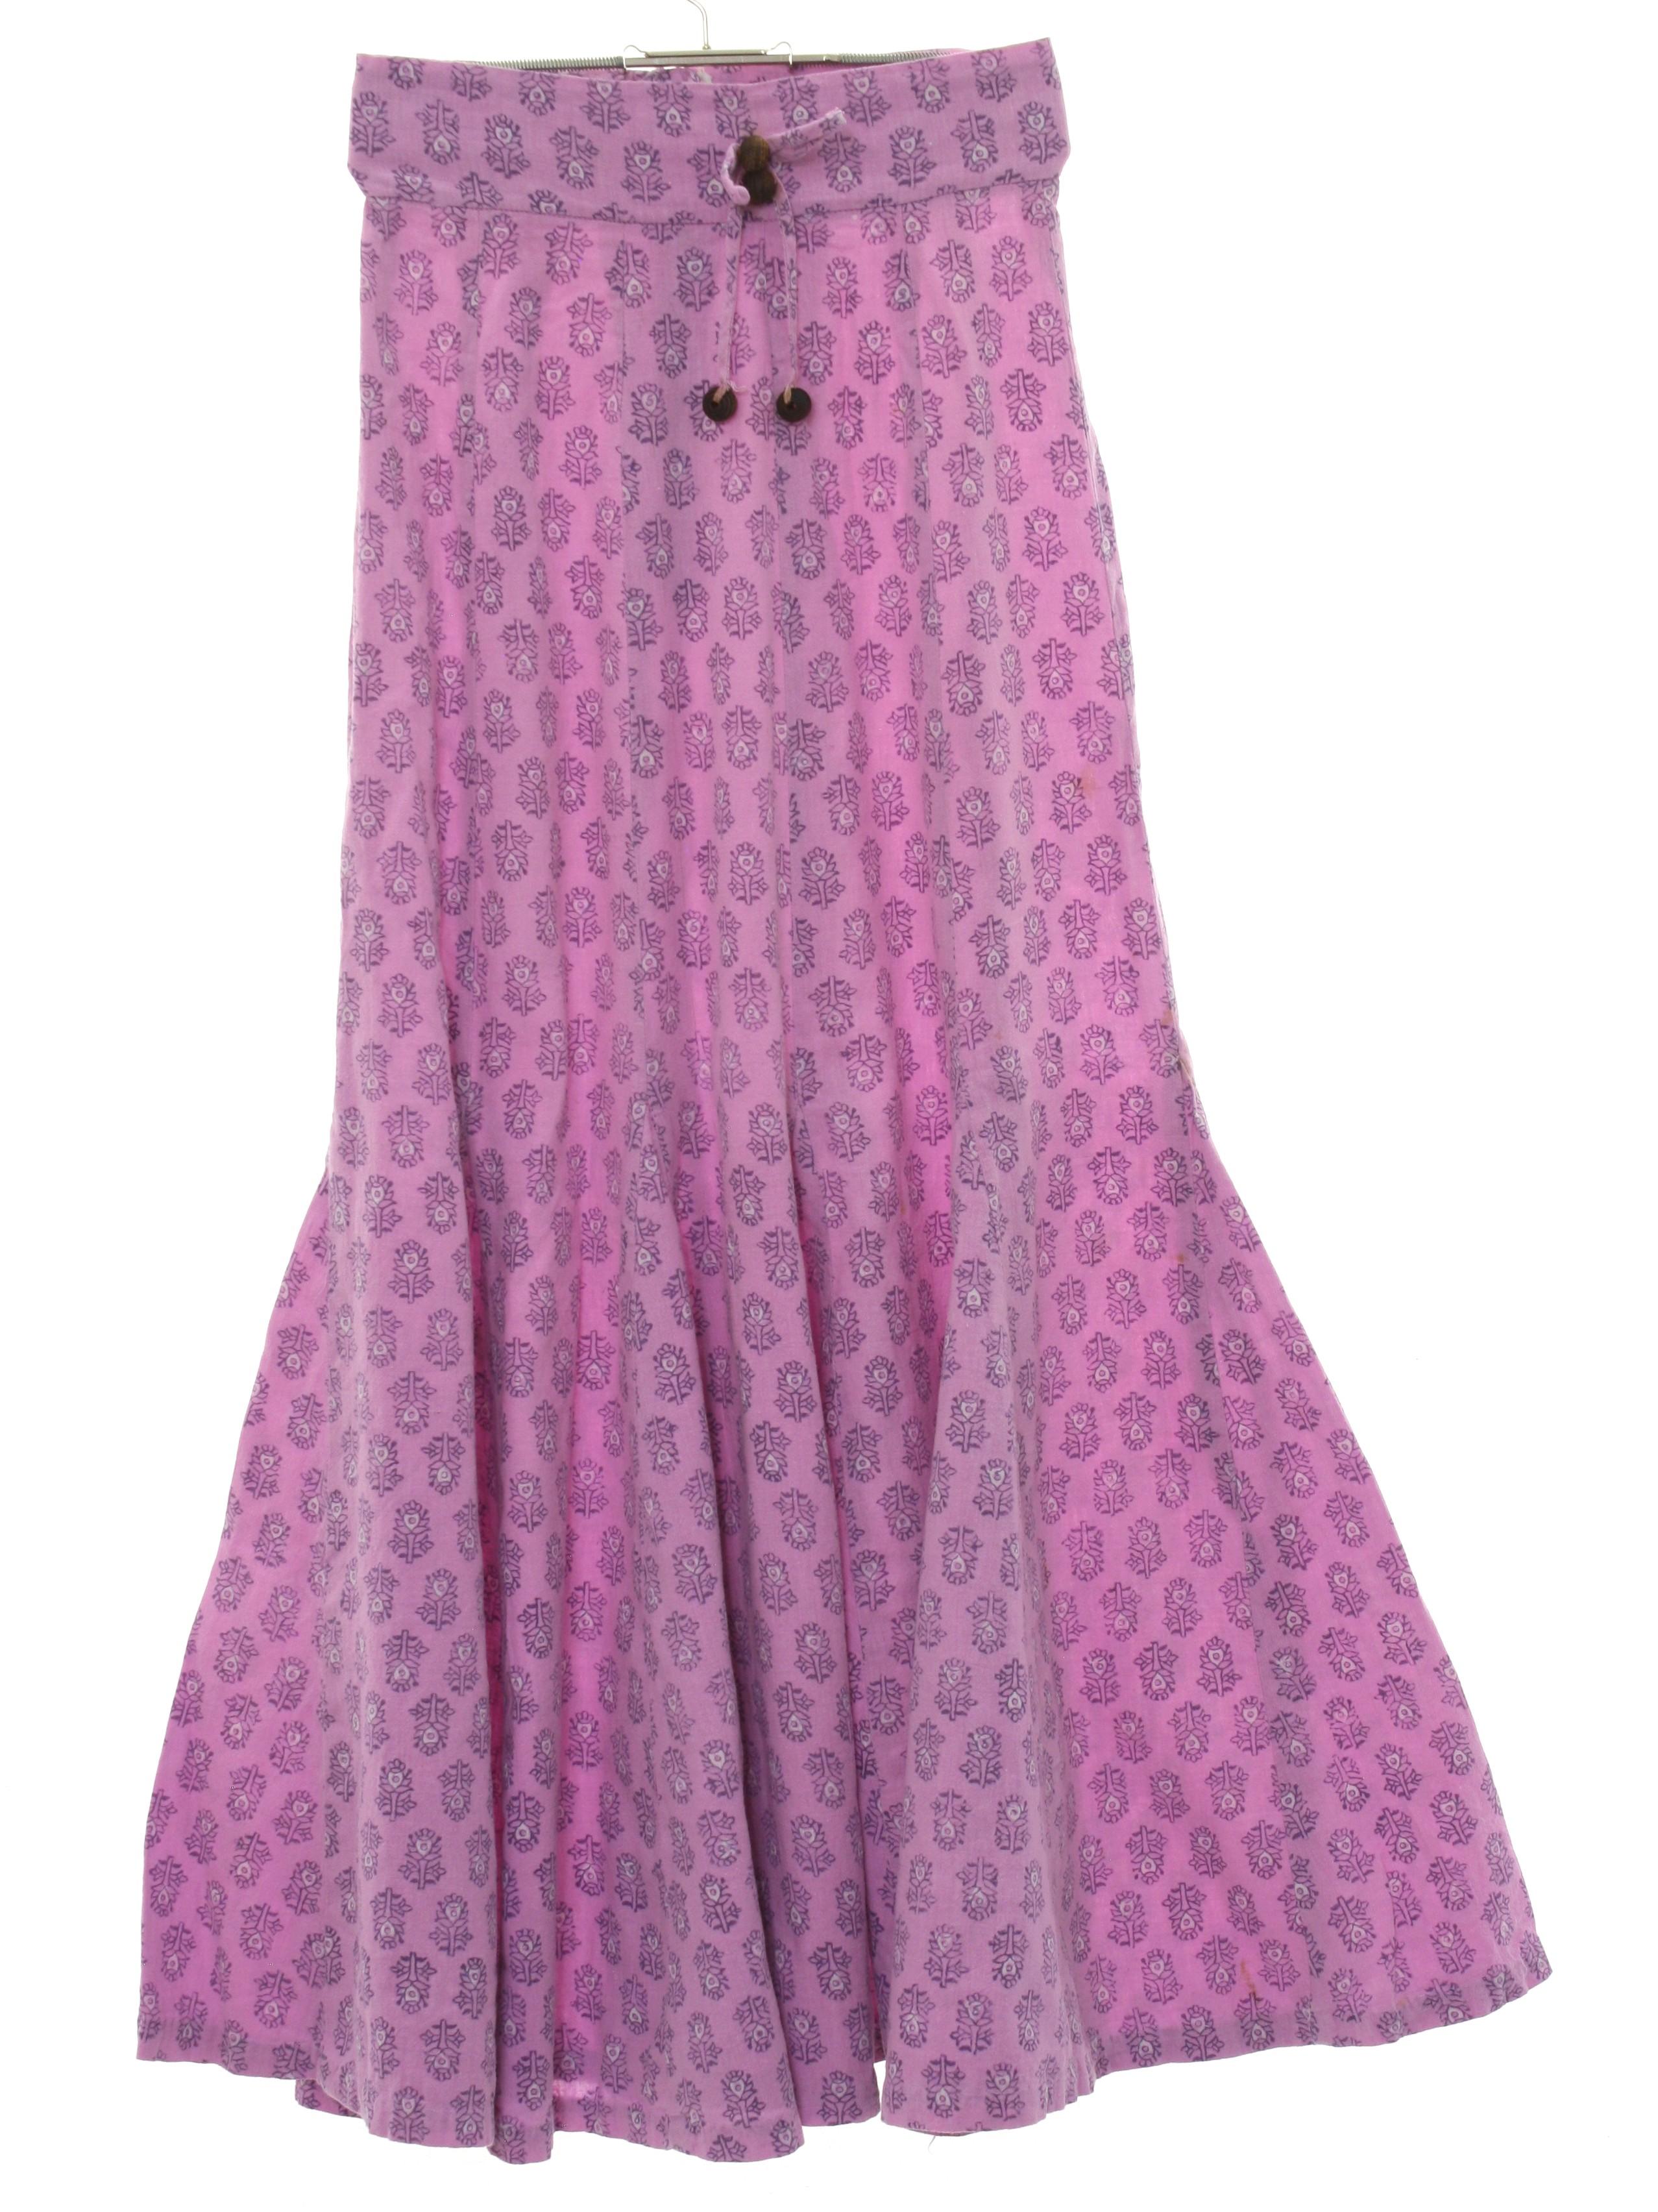 Retro 1980s Hippie Skirt India Imports 80s India Imports